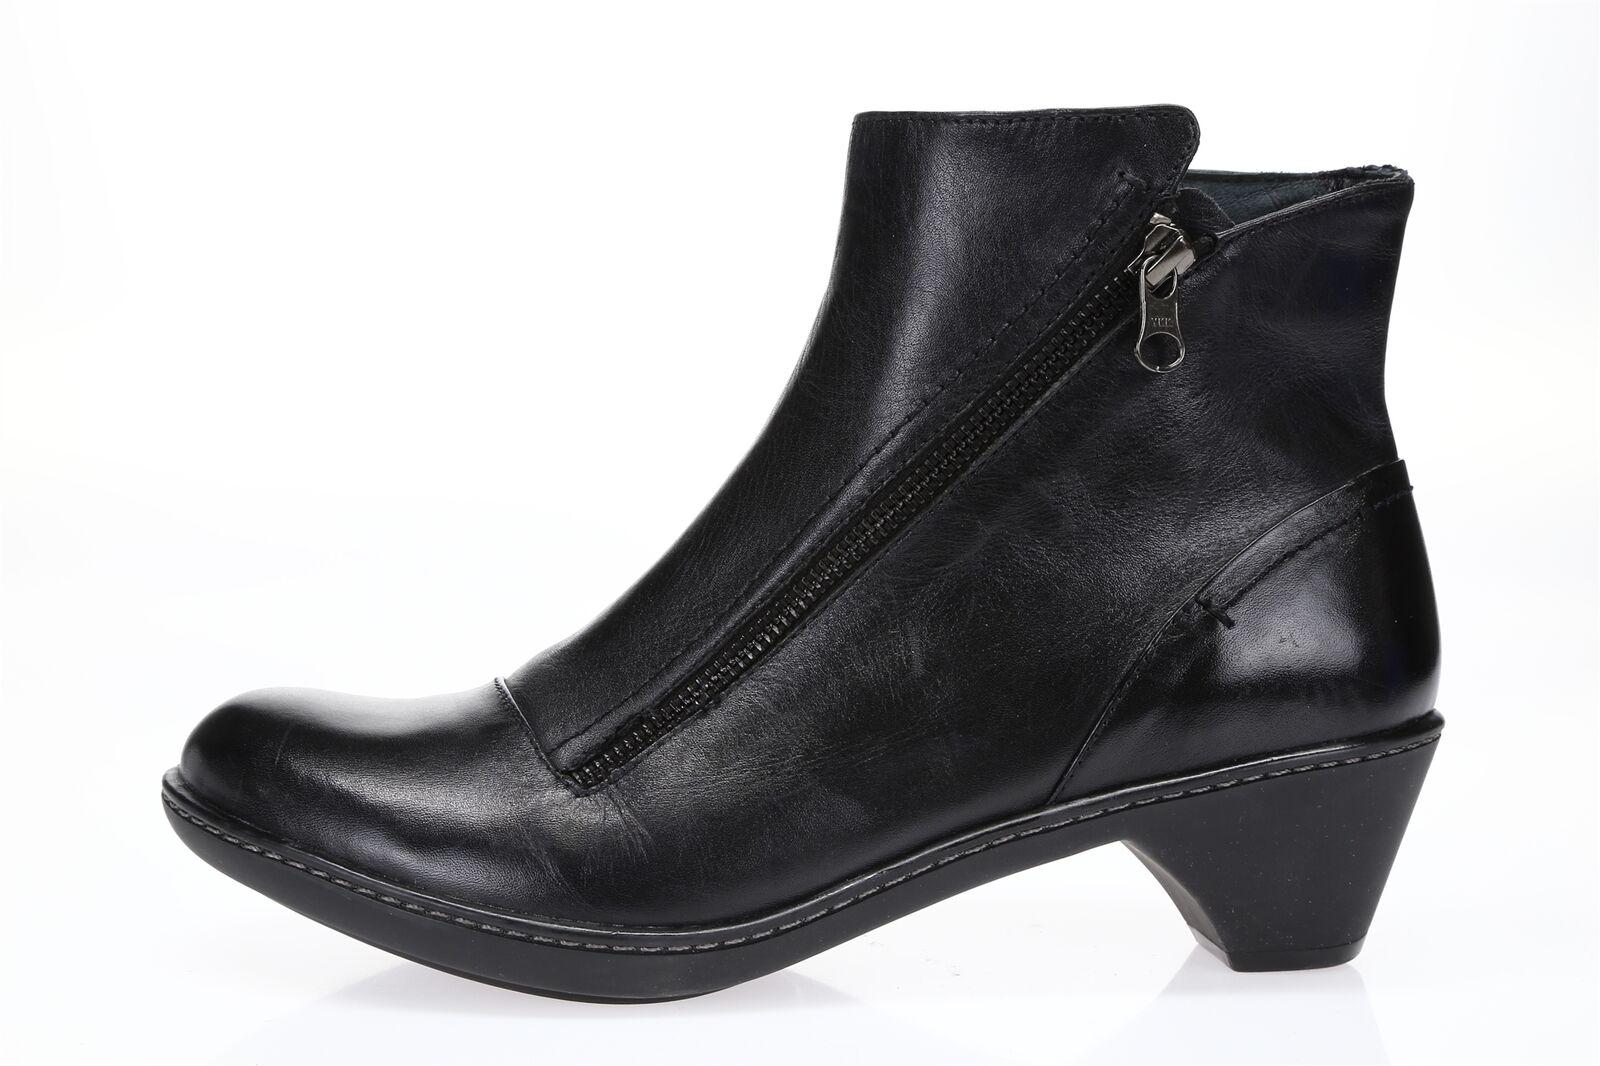 DANSKO Womens Black Leather Sz 40 Urban Ankle Boots 220323